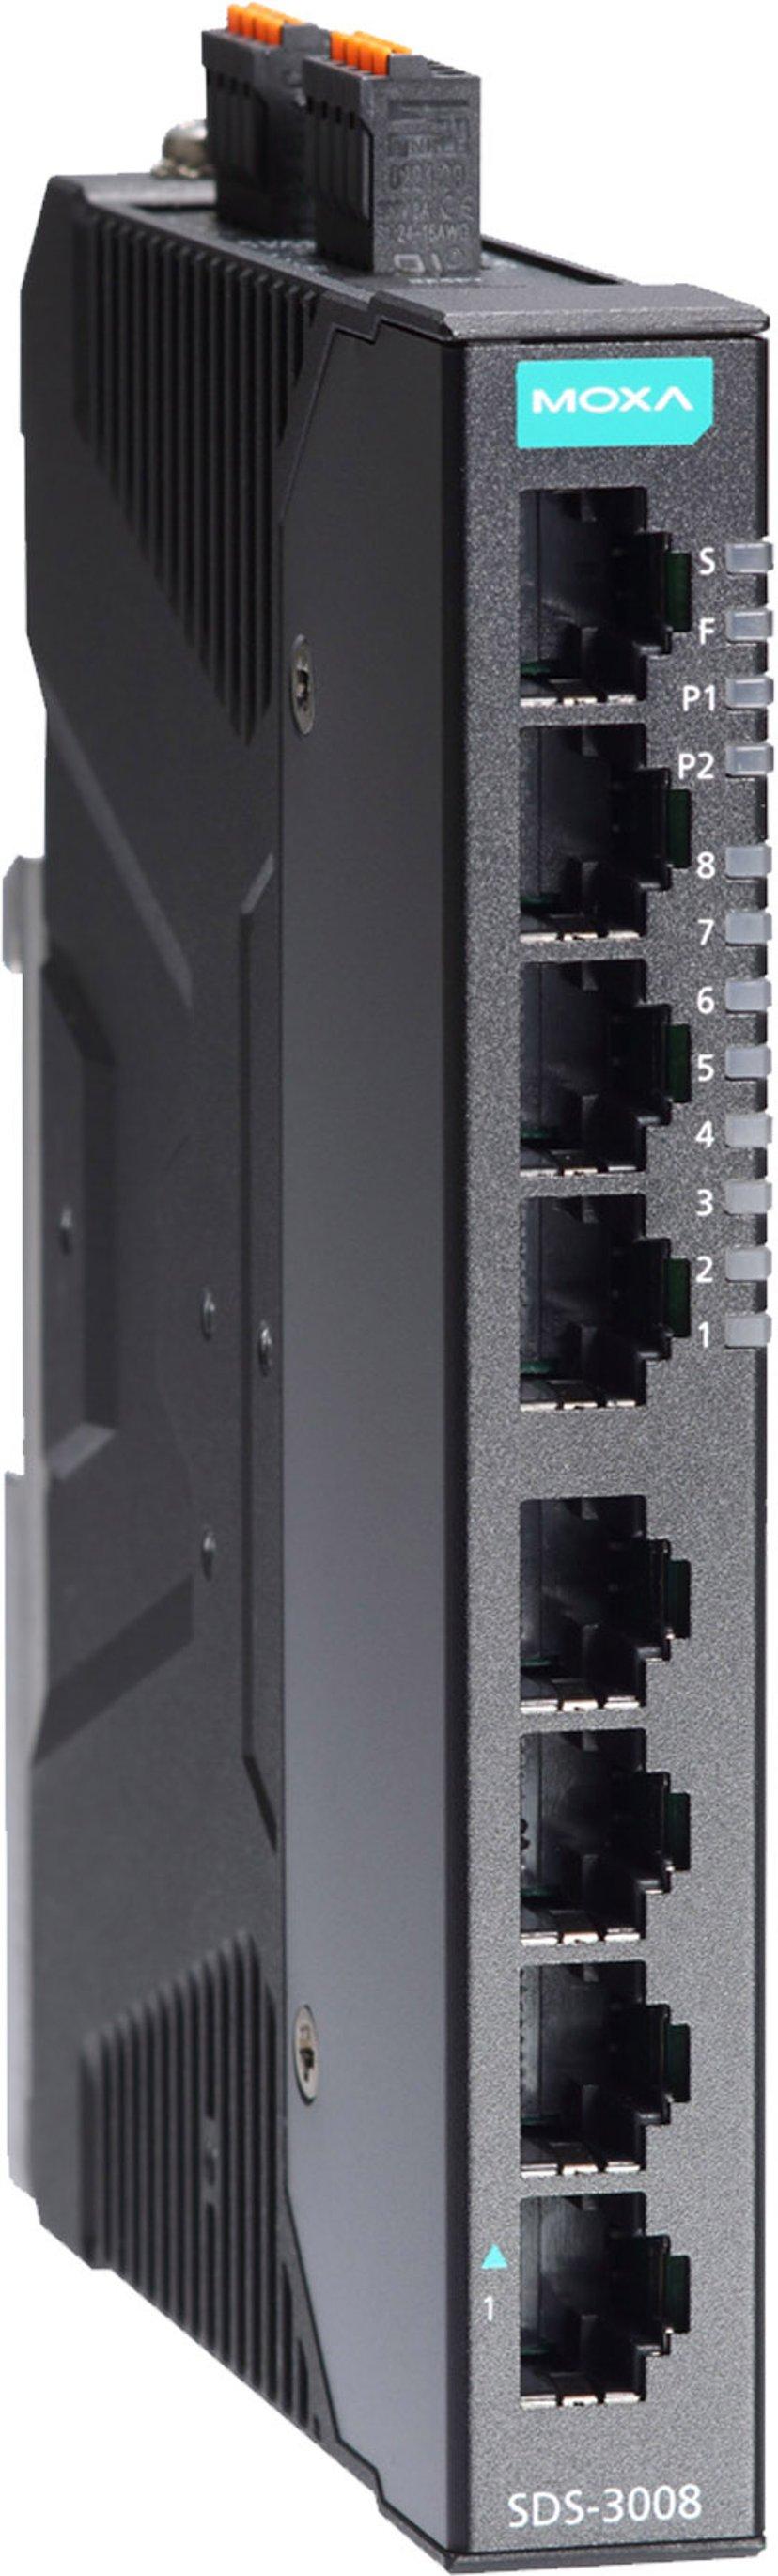 Moxa SDS-3008 Industriell Smart 8-port Switch